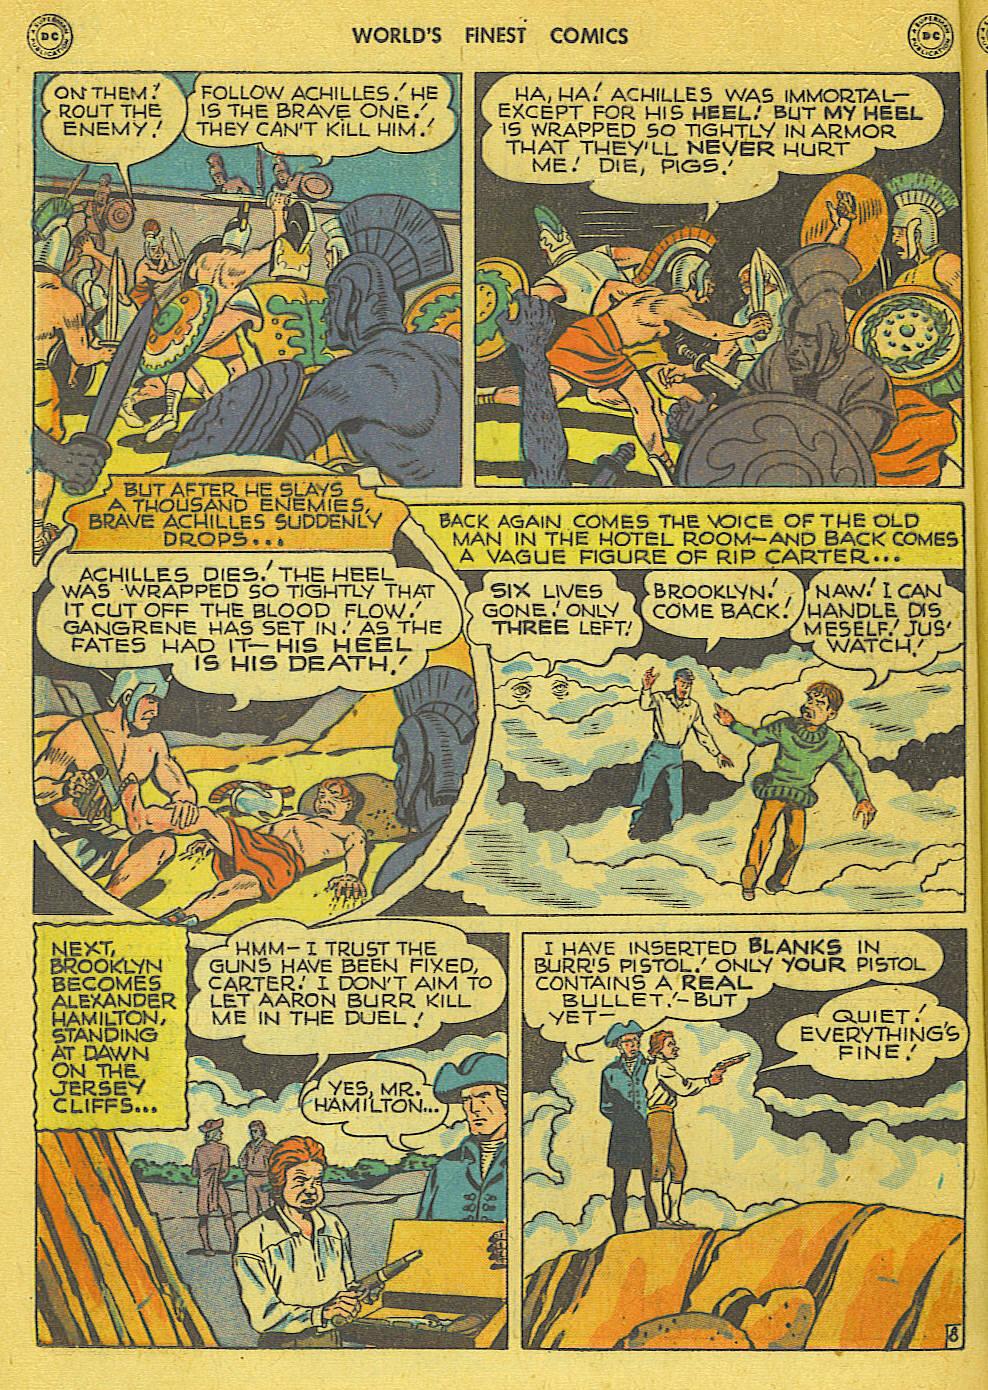 Read online World's Finest Comics comic -  Issue #34 - 34